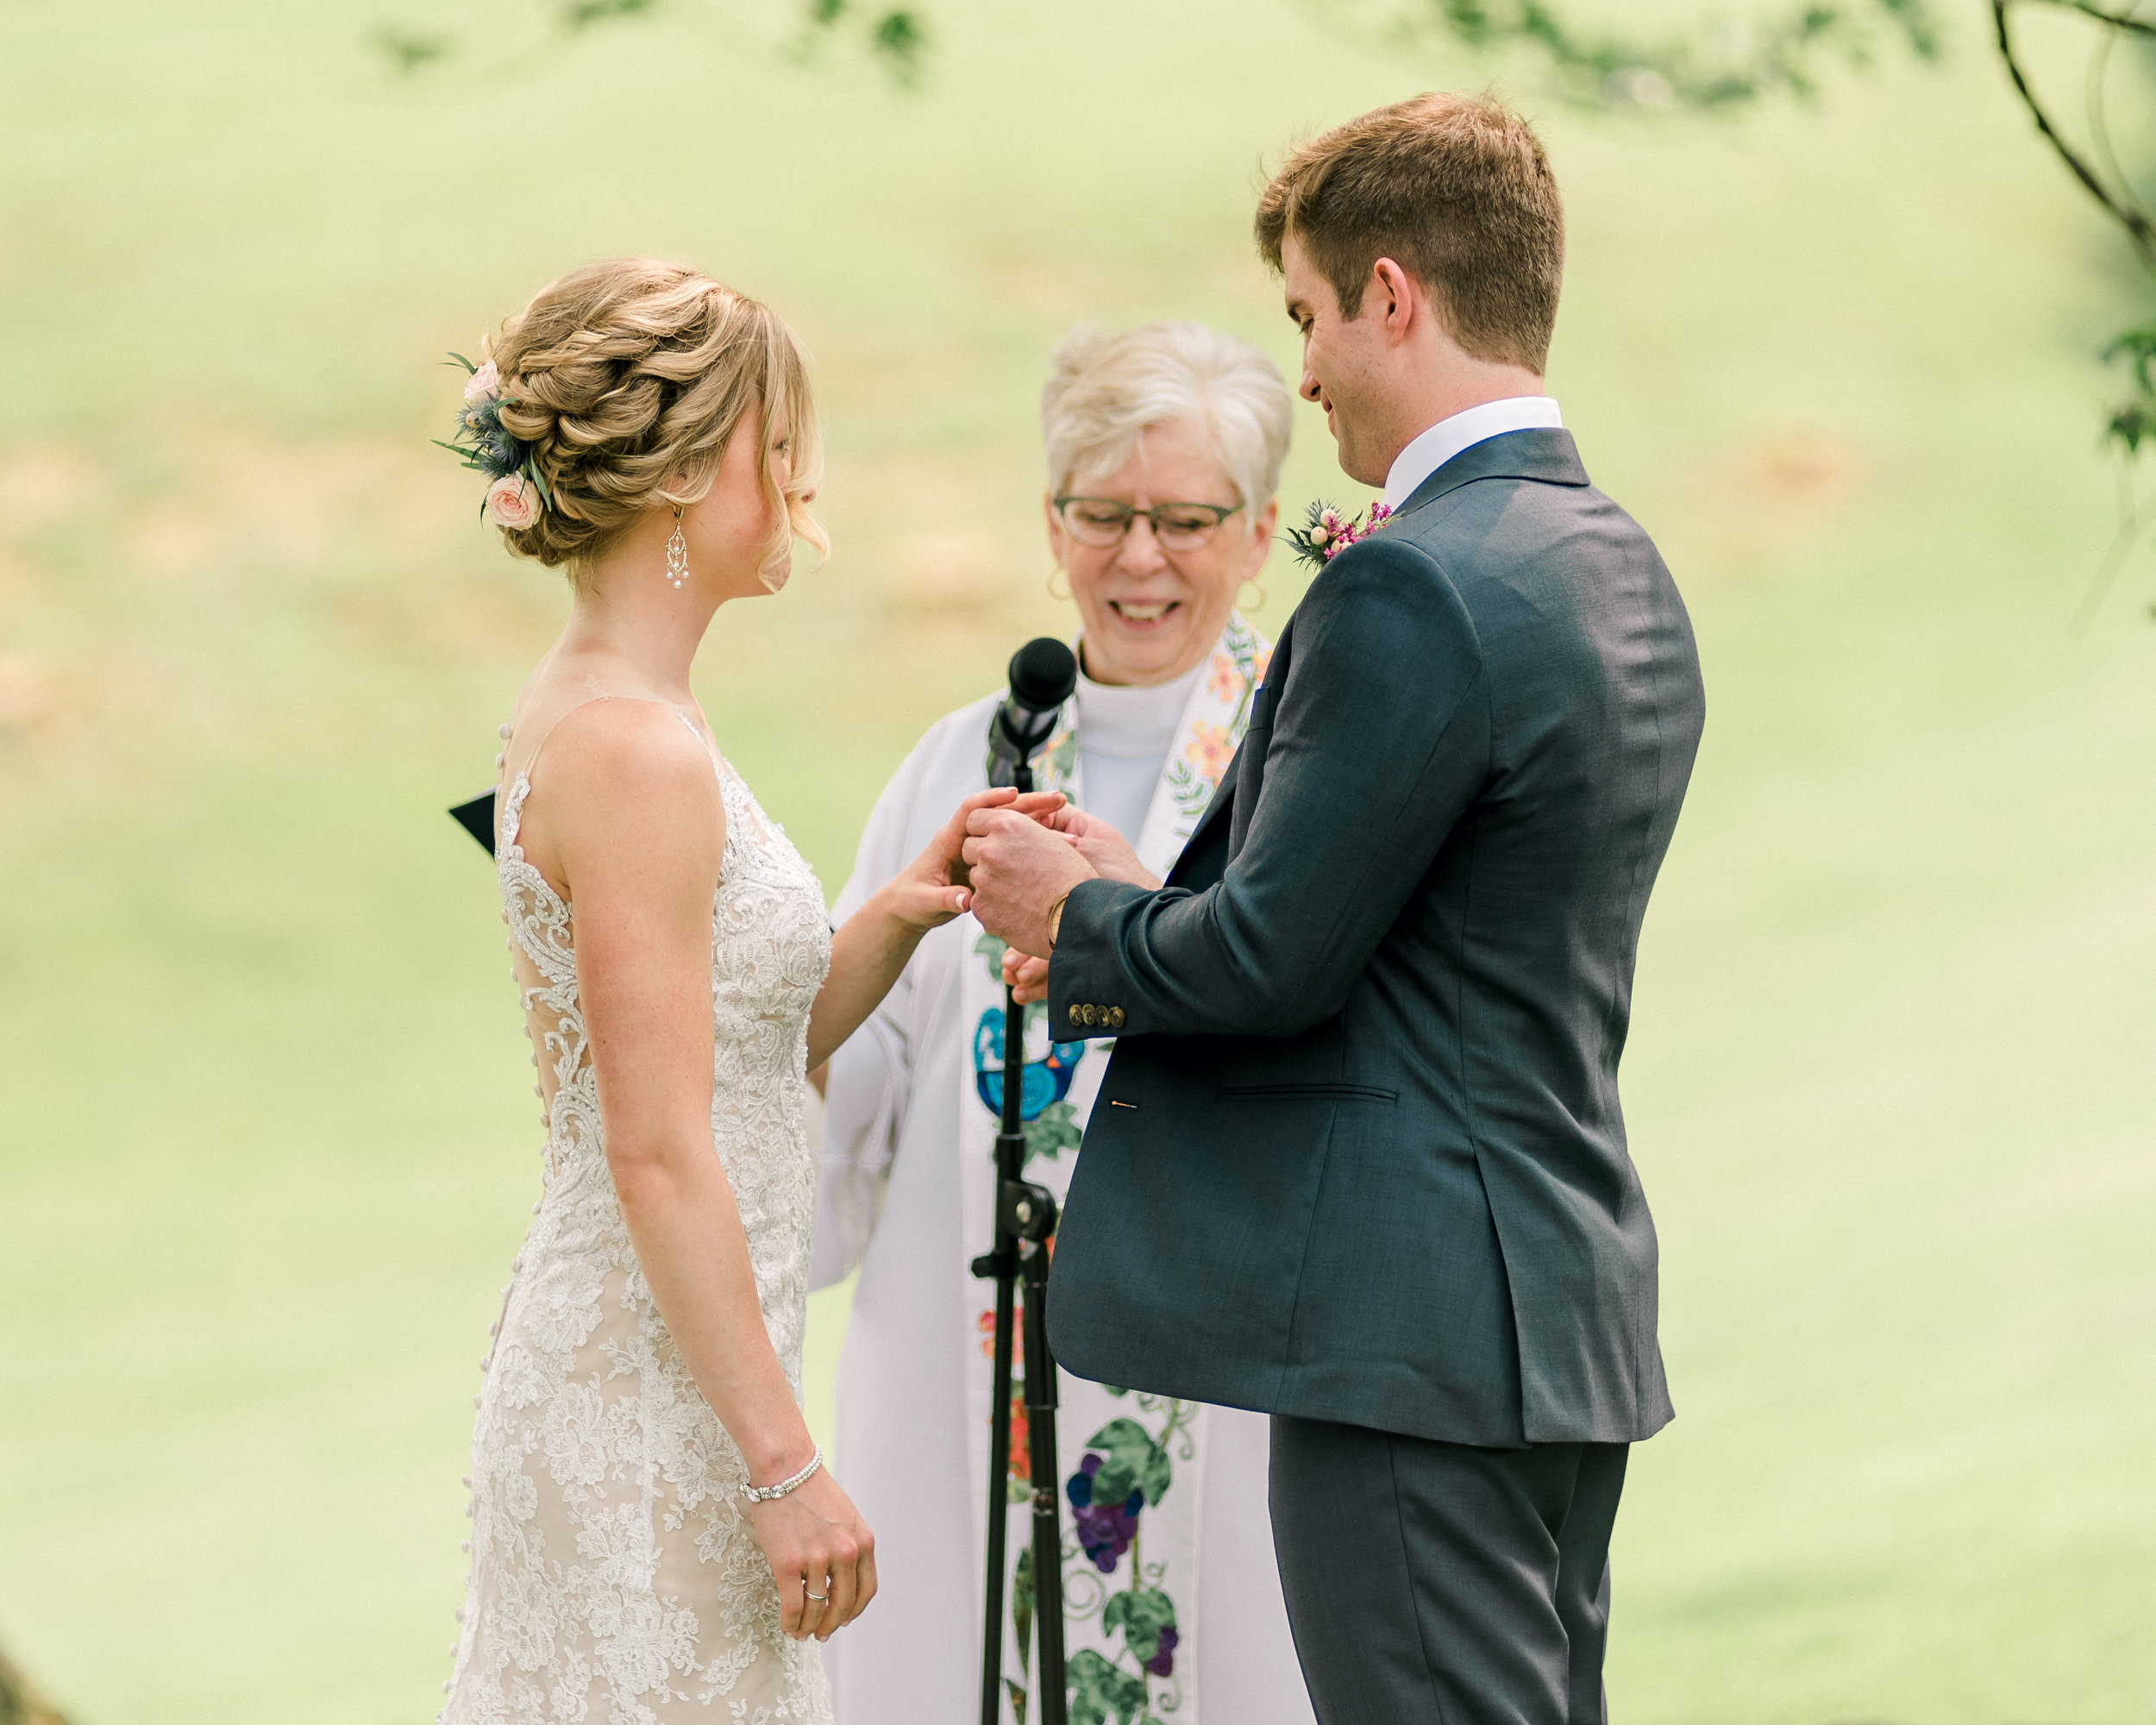 pittsburgh-wedding-photographer-shady-elms-farm-0042.jpg